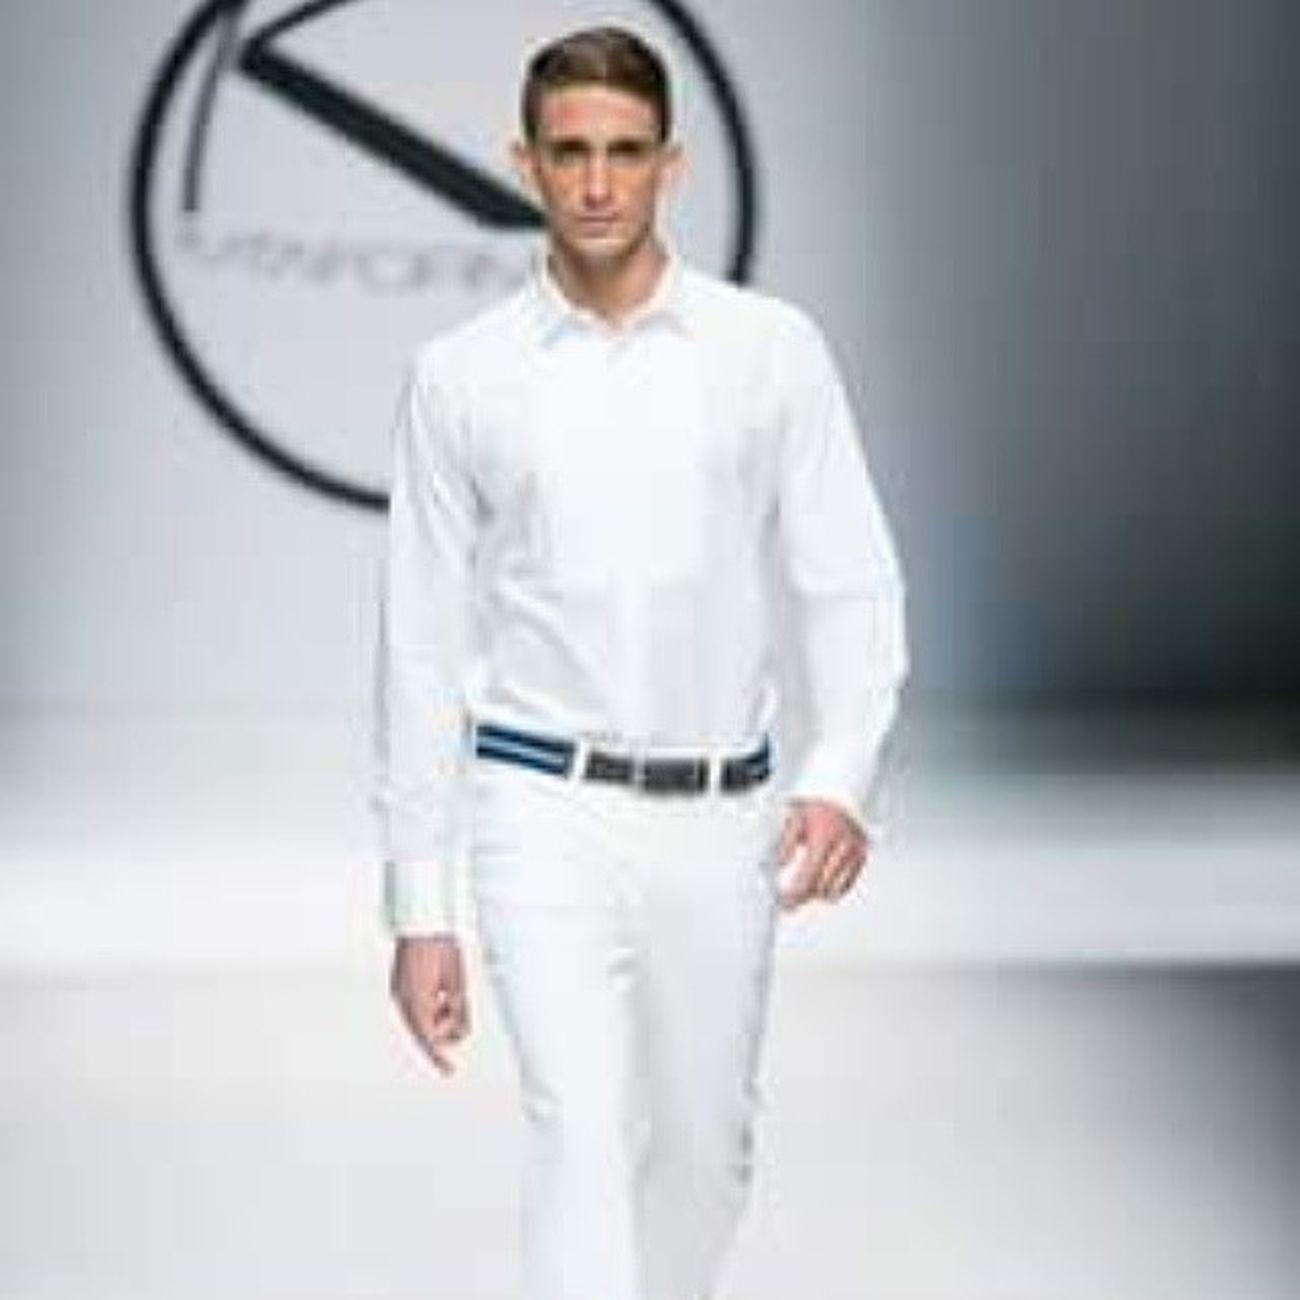 Times Linacantillo Pk Plataformak Runway New negocios malemodel beautifulday photo instagram informamodels @informamidels @chachaposada